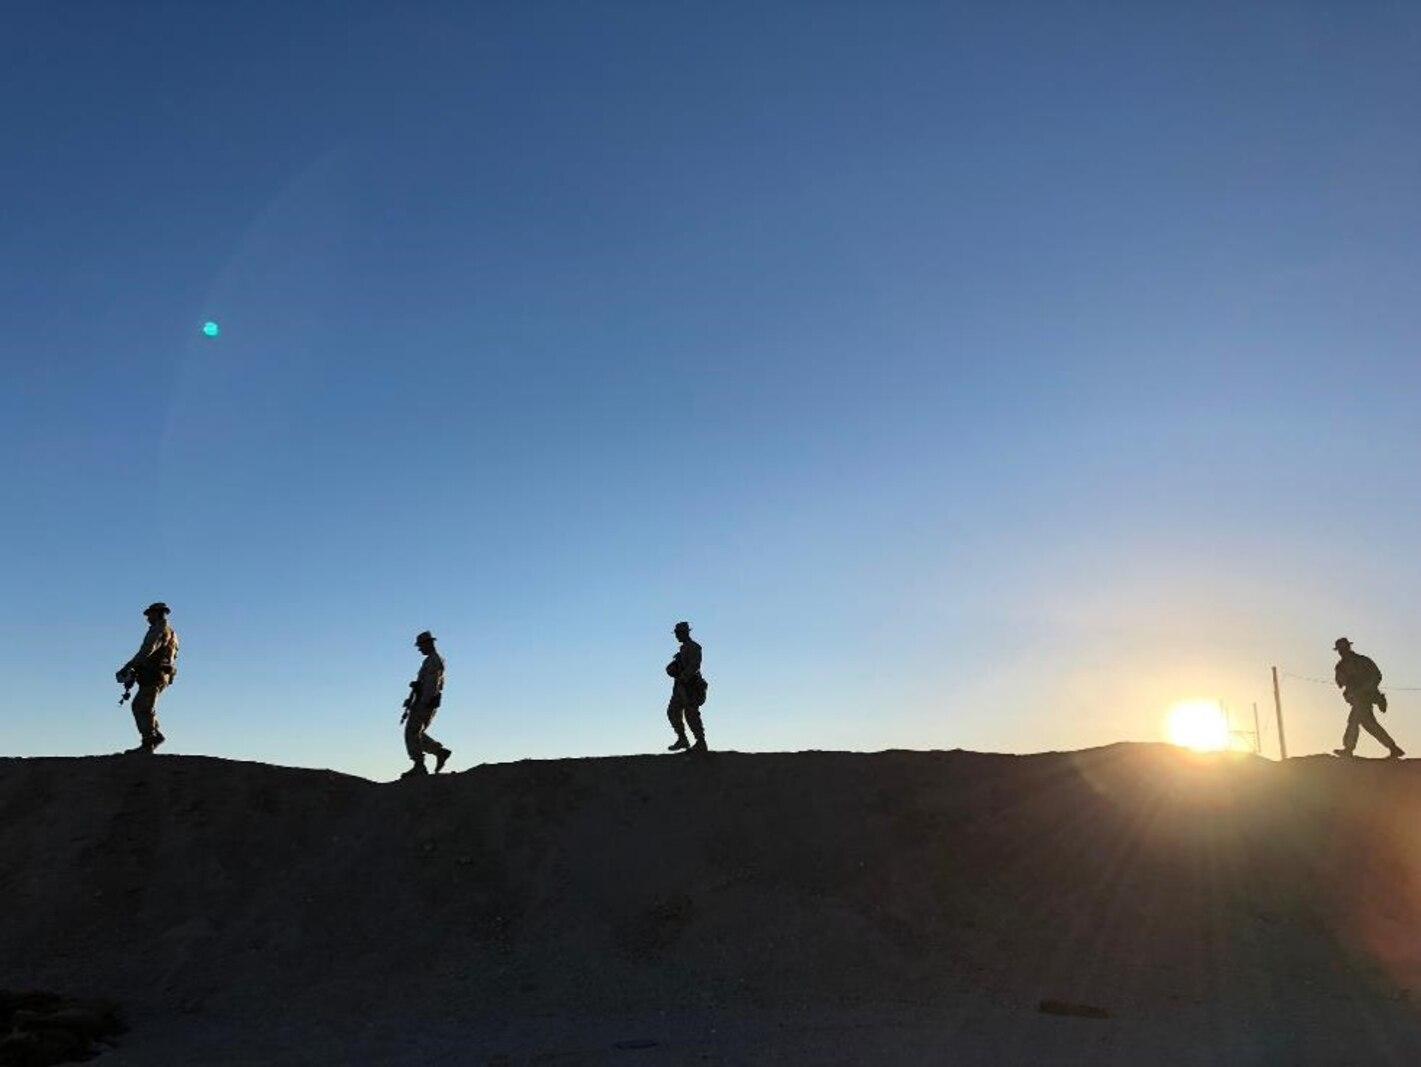 Island Warriors at sunset